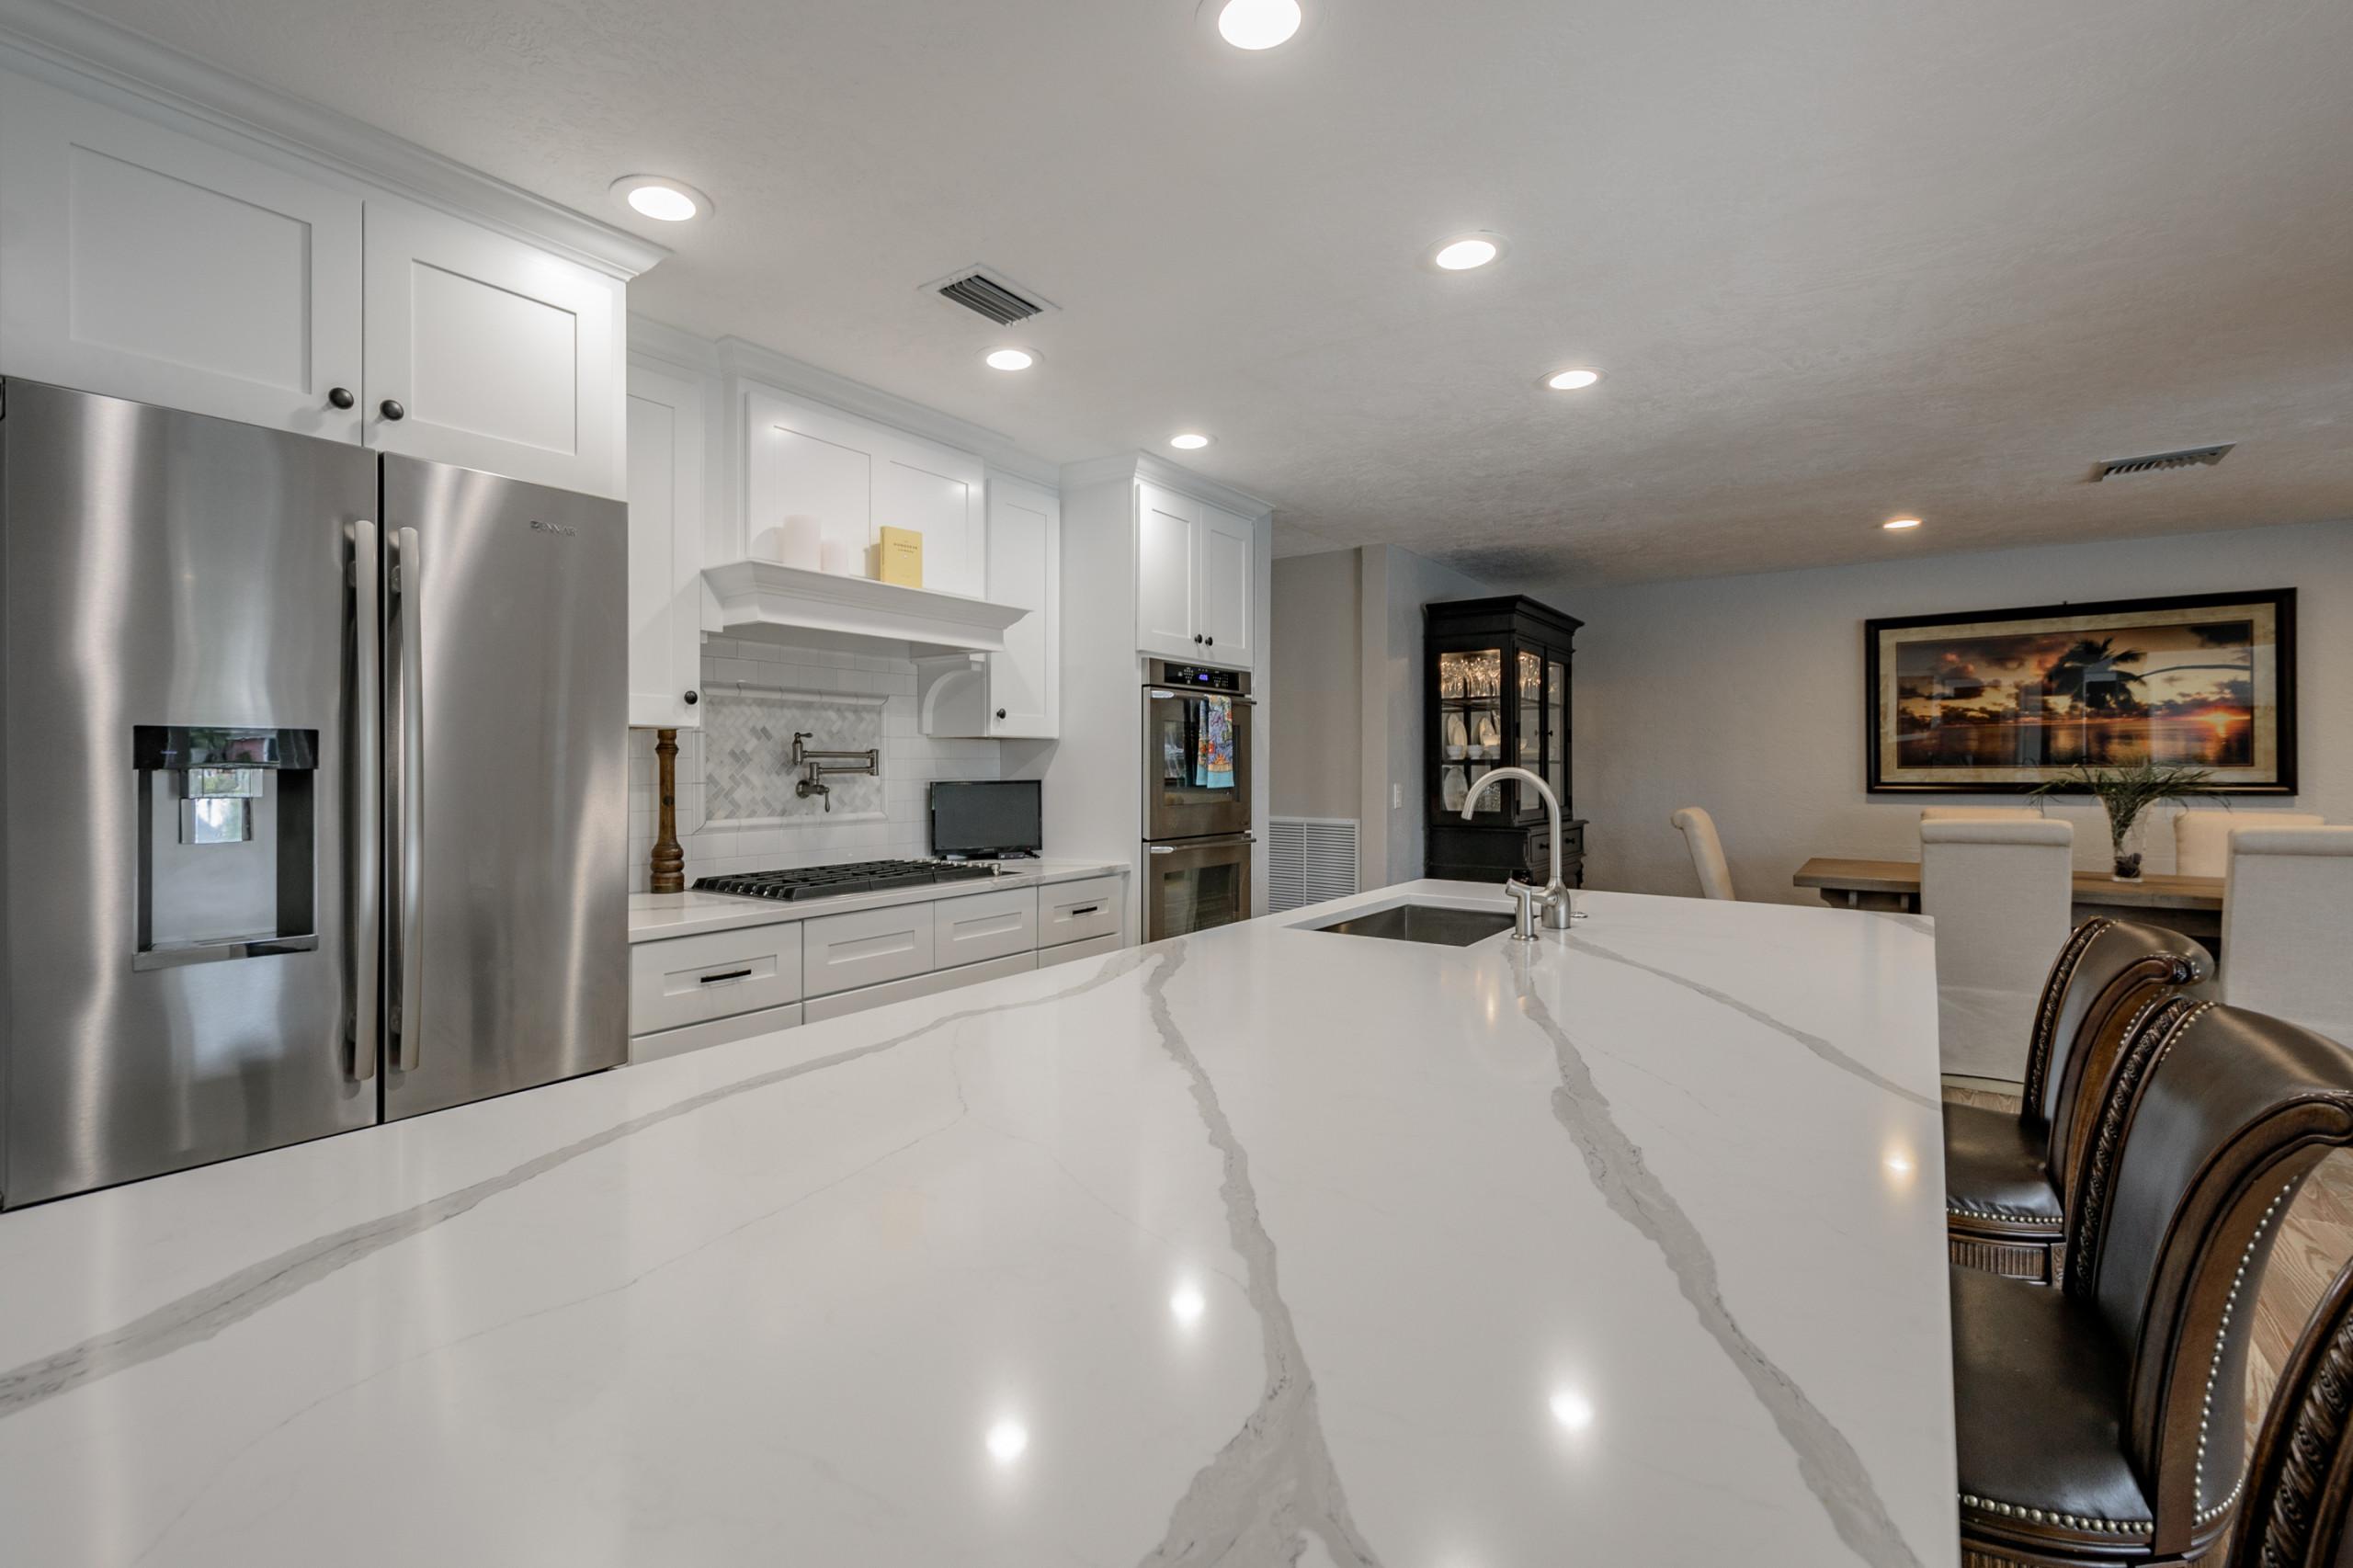 Coastal kitchen with natural pine floors